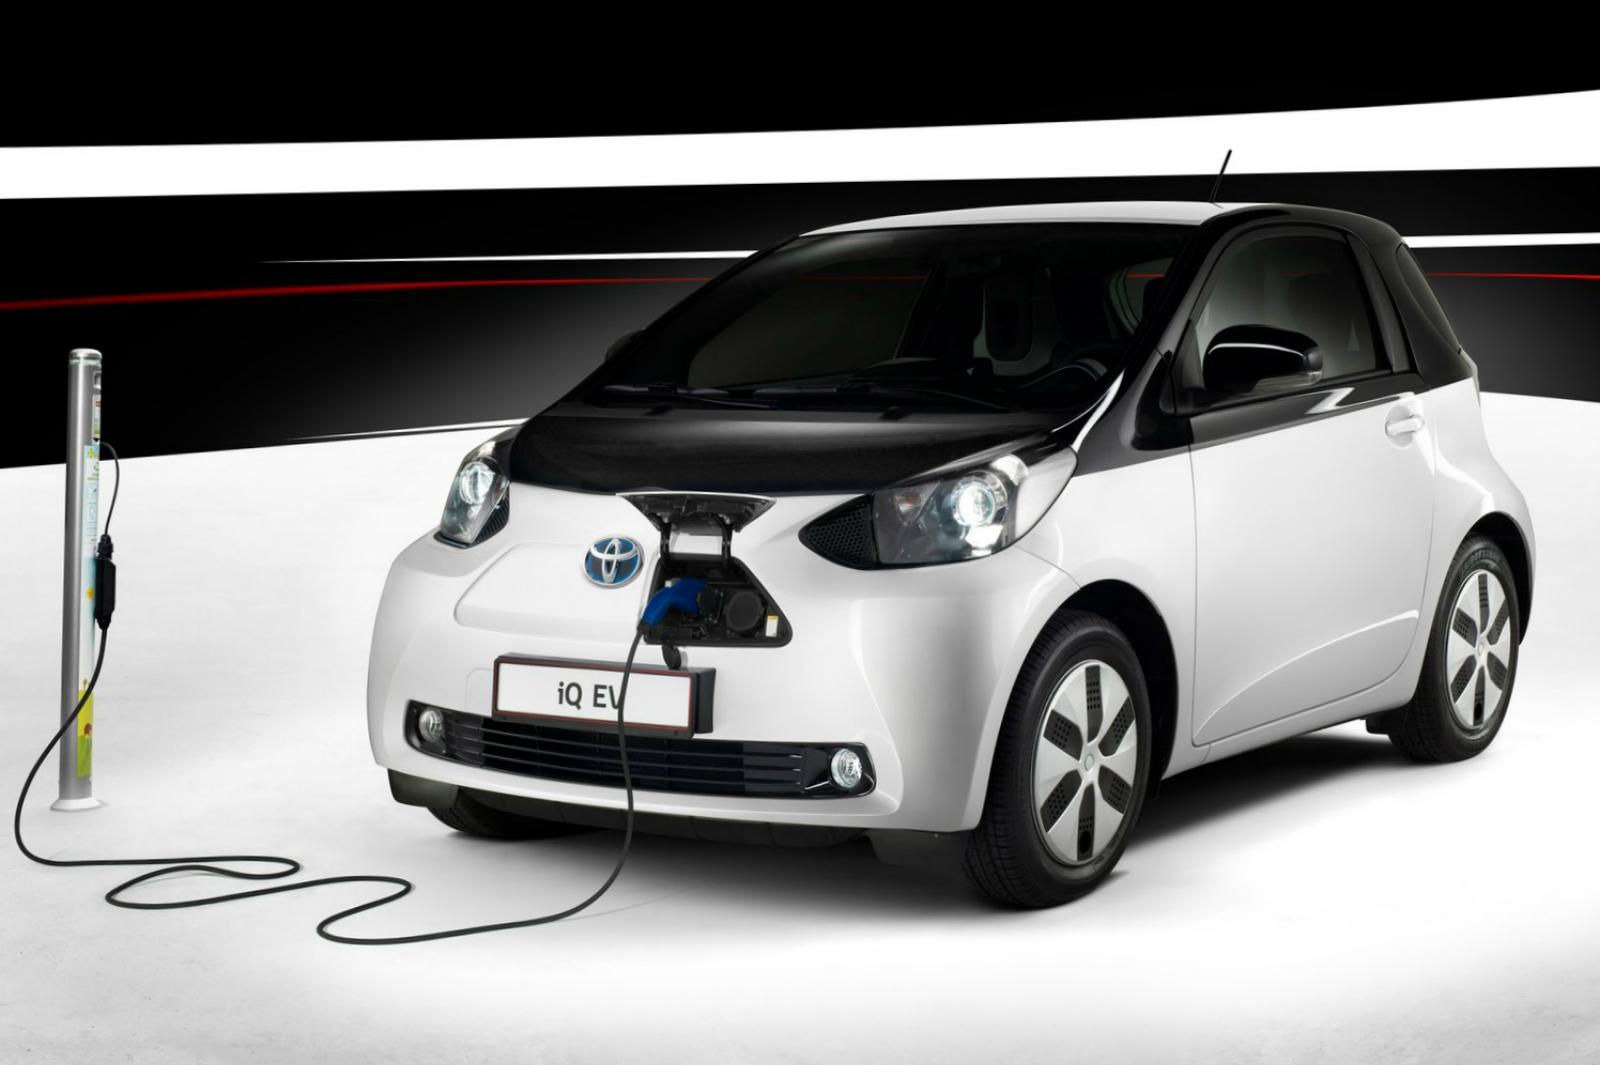 2013 Toyota iQ EV